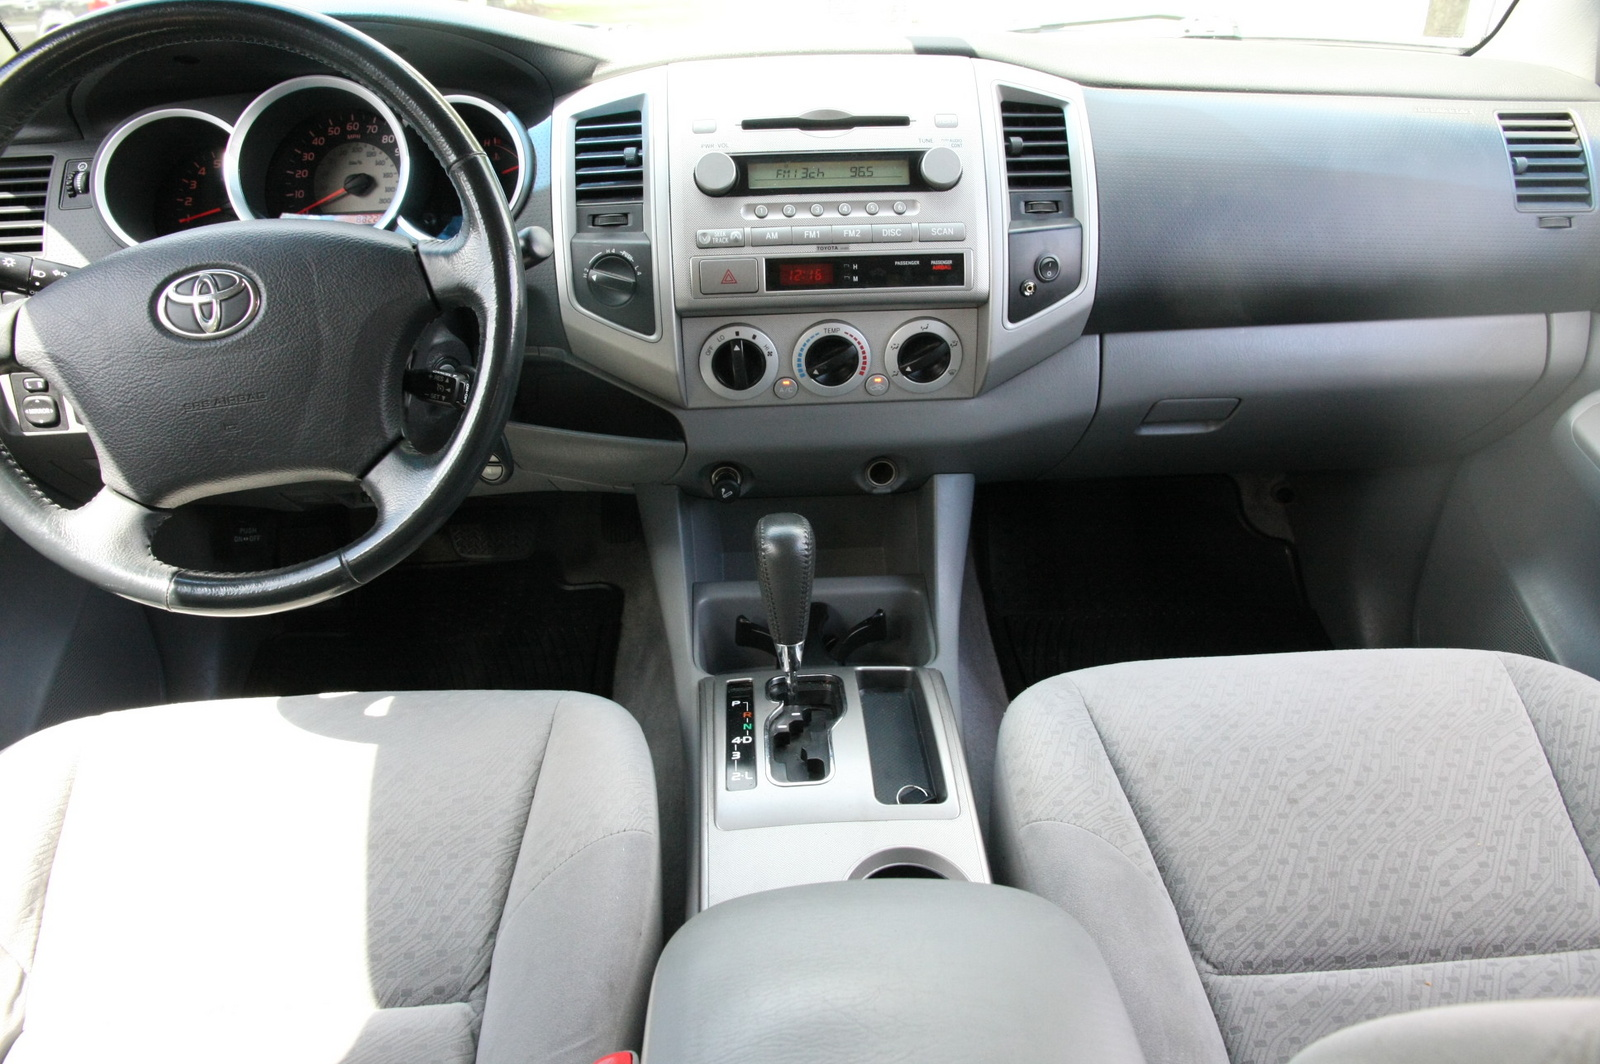 2006 Toyota Tacoma Interior